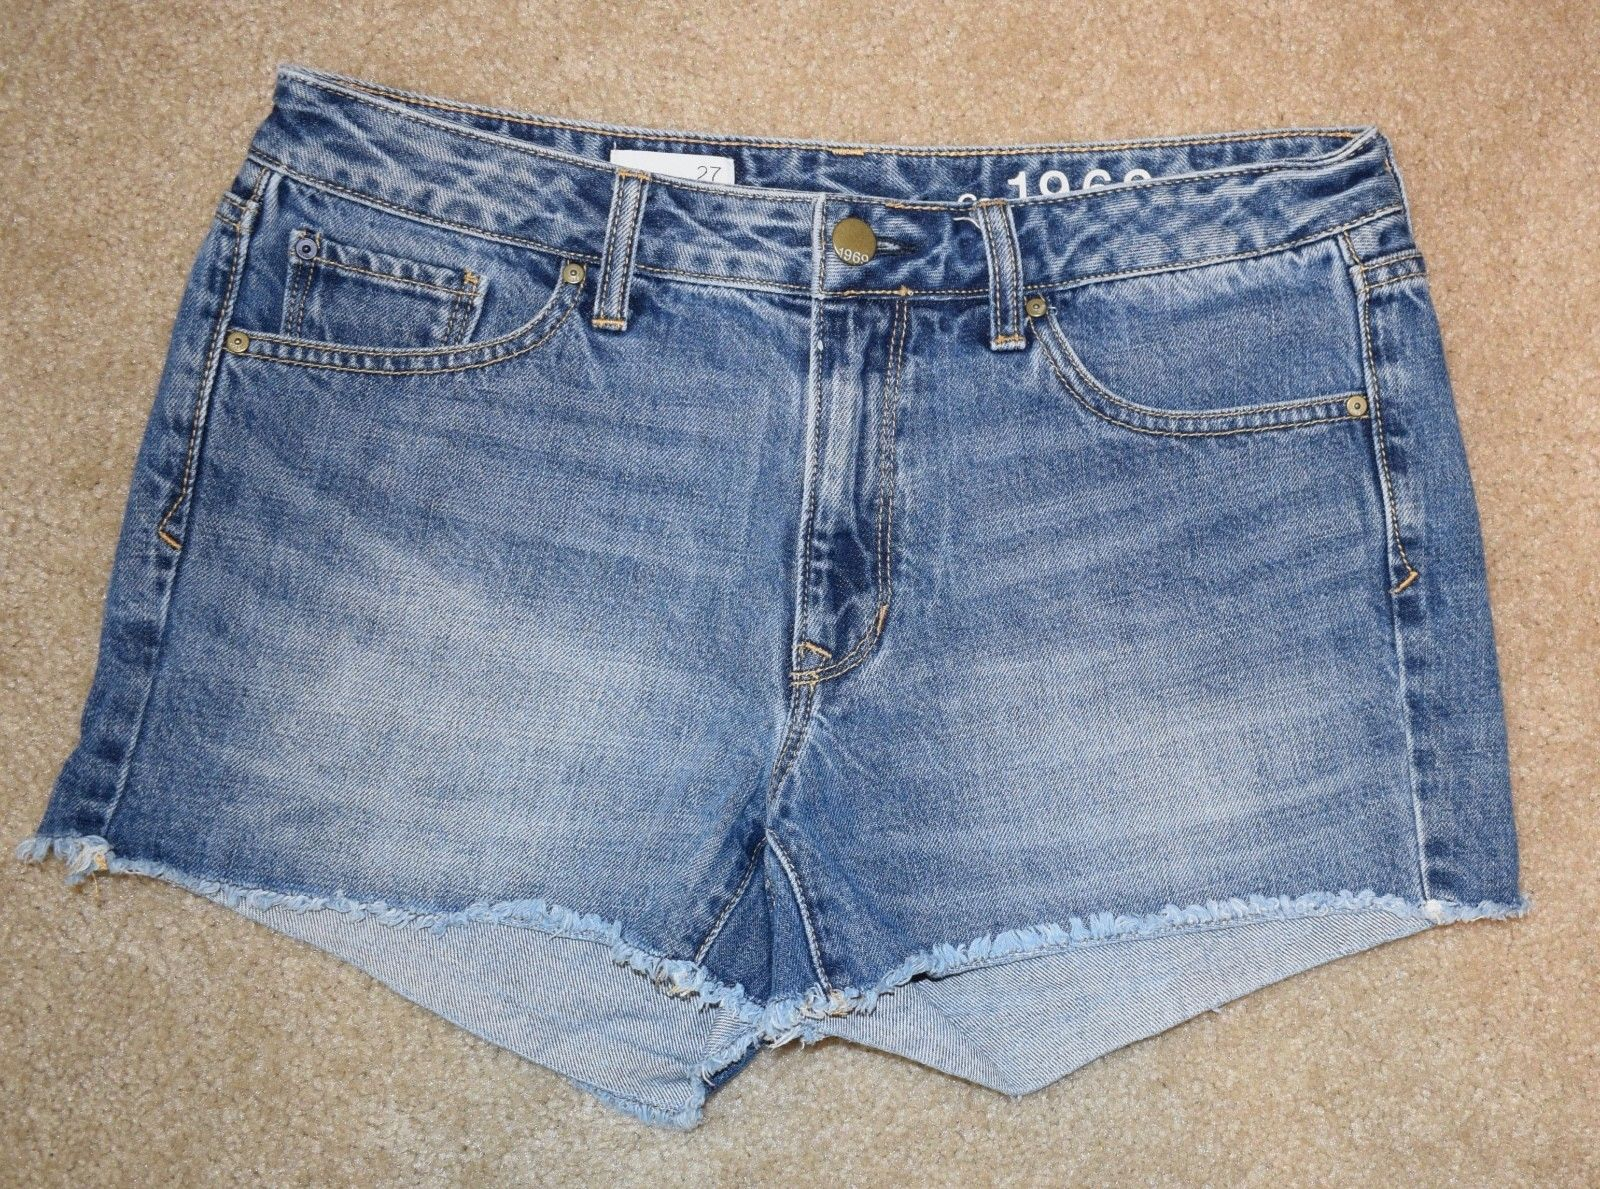 Gap Jean Shorts 27 Fringe Slim Cut Offs 4